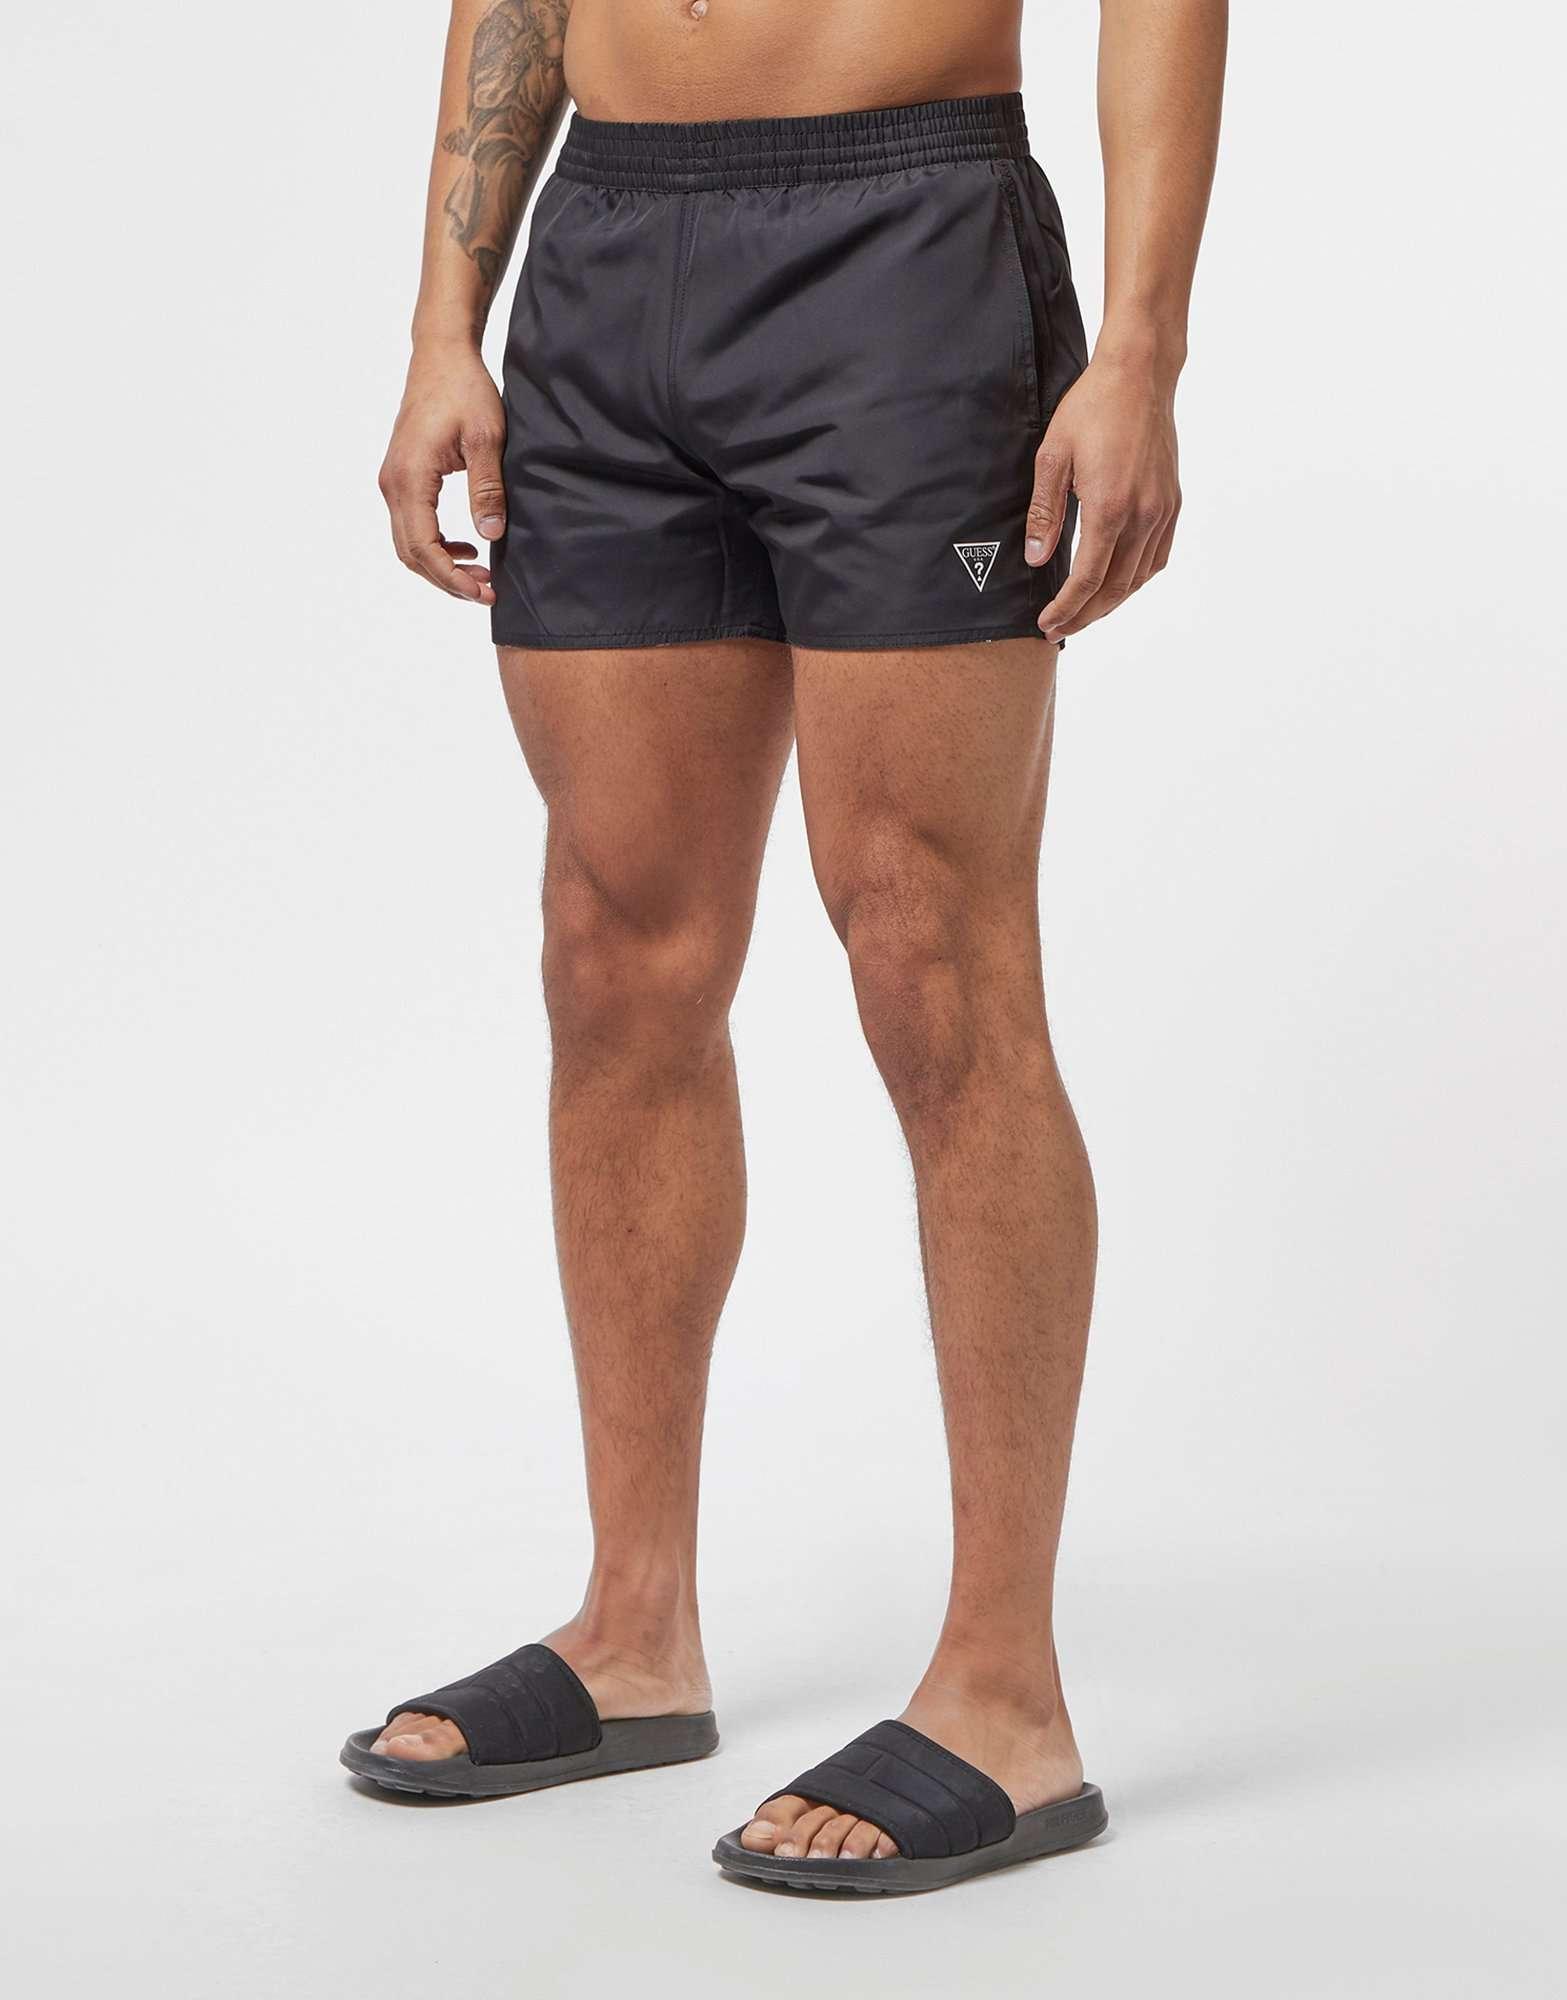 Guess Reversible Swim Shorts